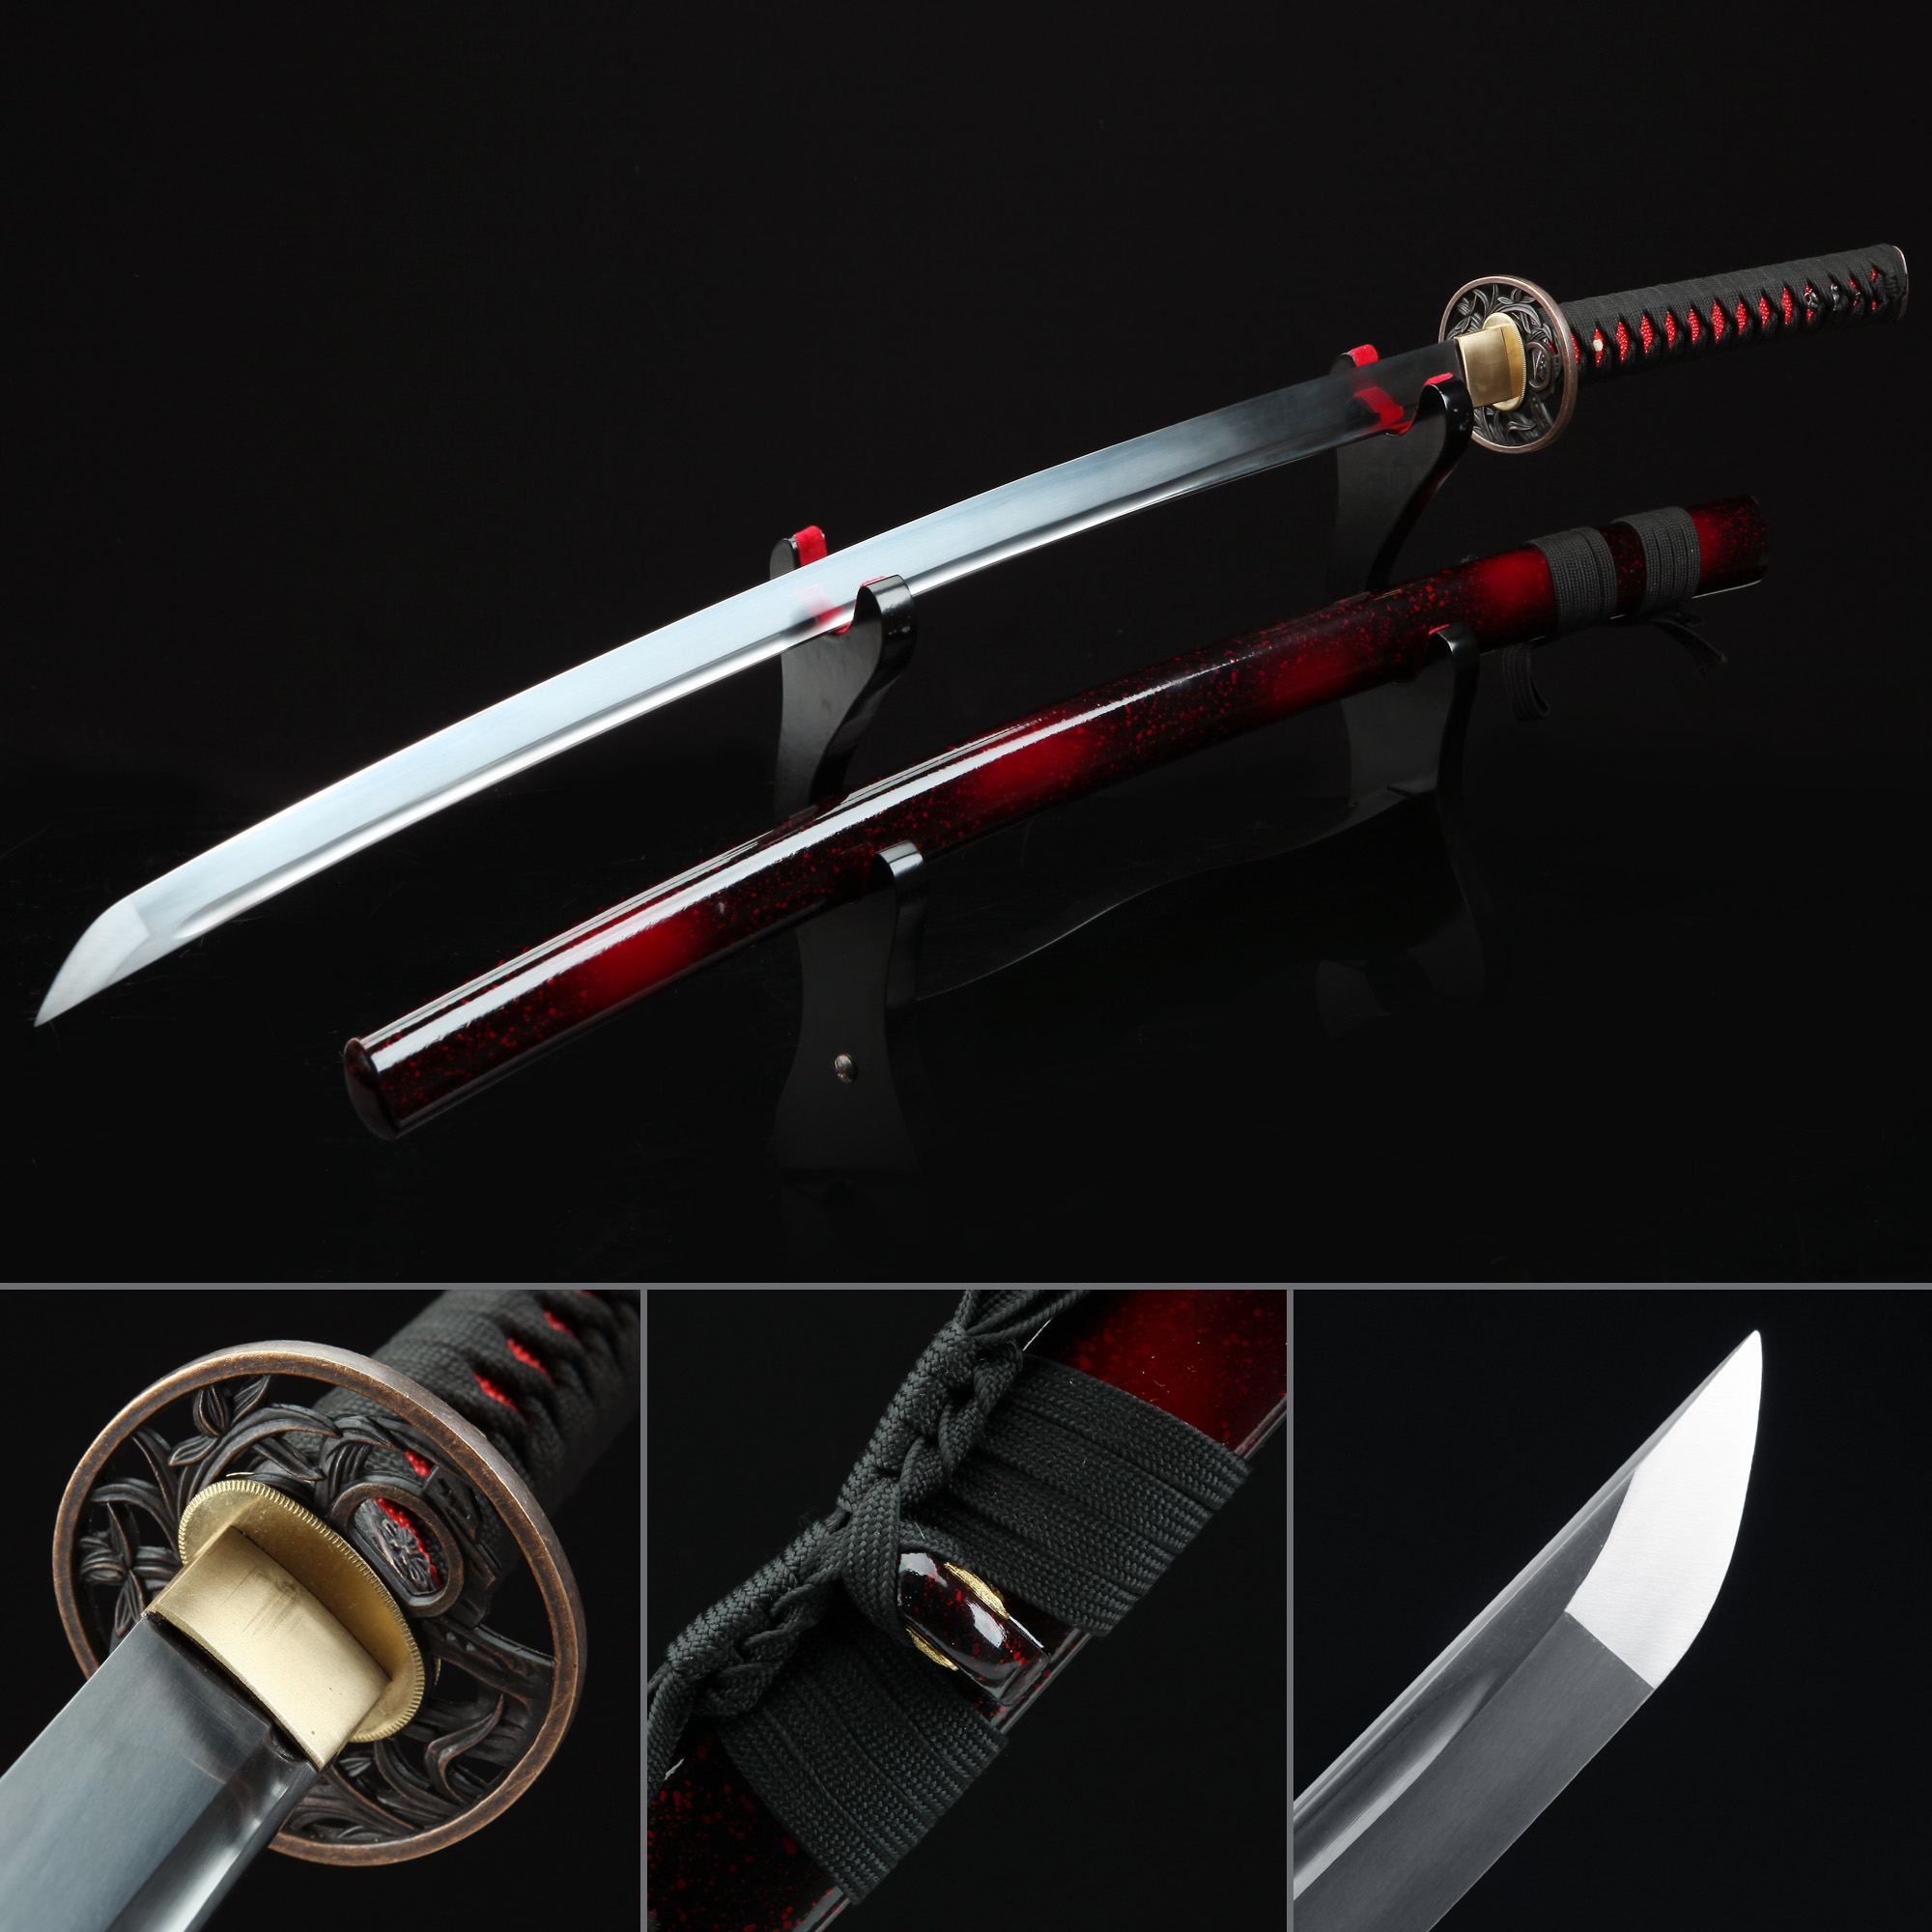 Handmade Black And Red Katana Japanese Samurai Swords With Orchid Tsuba